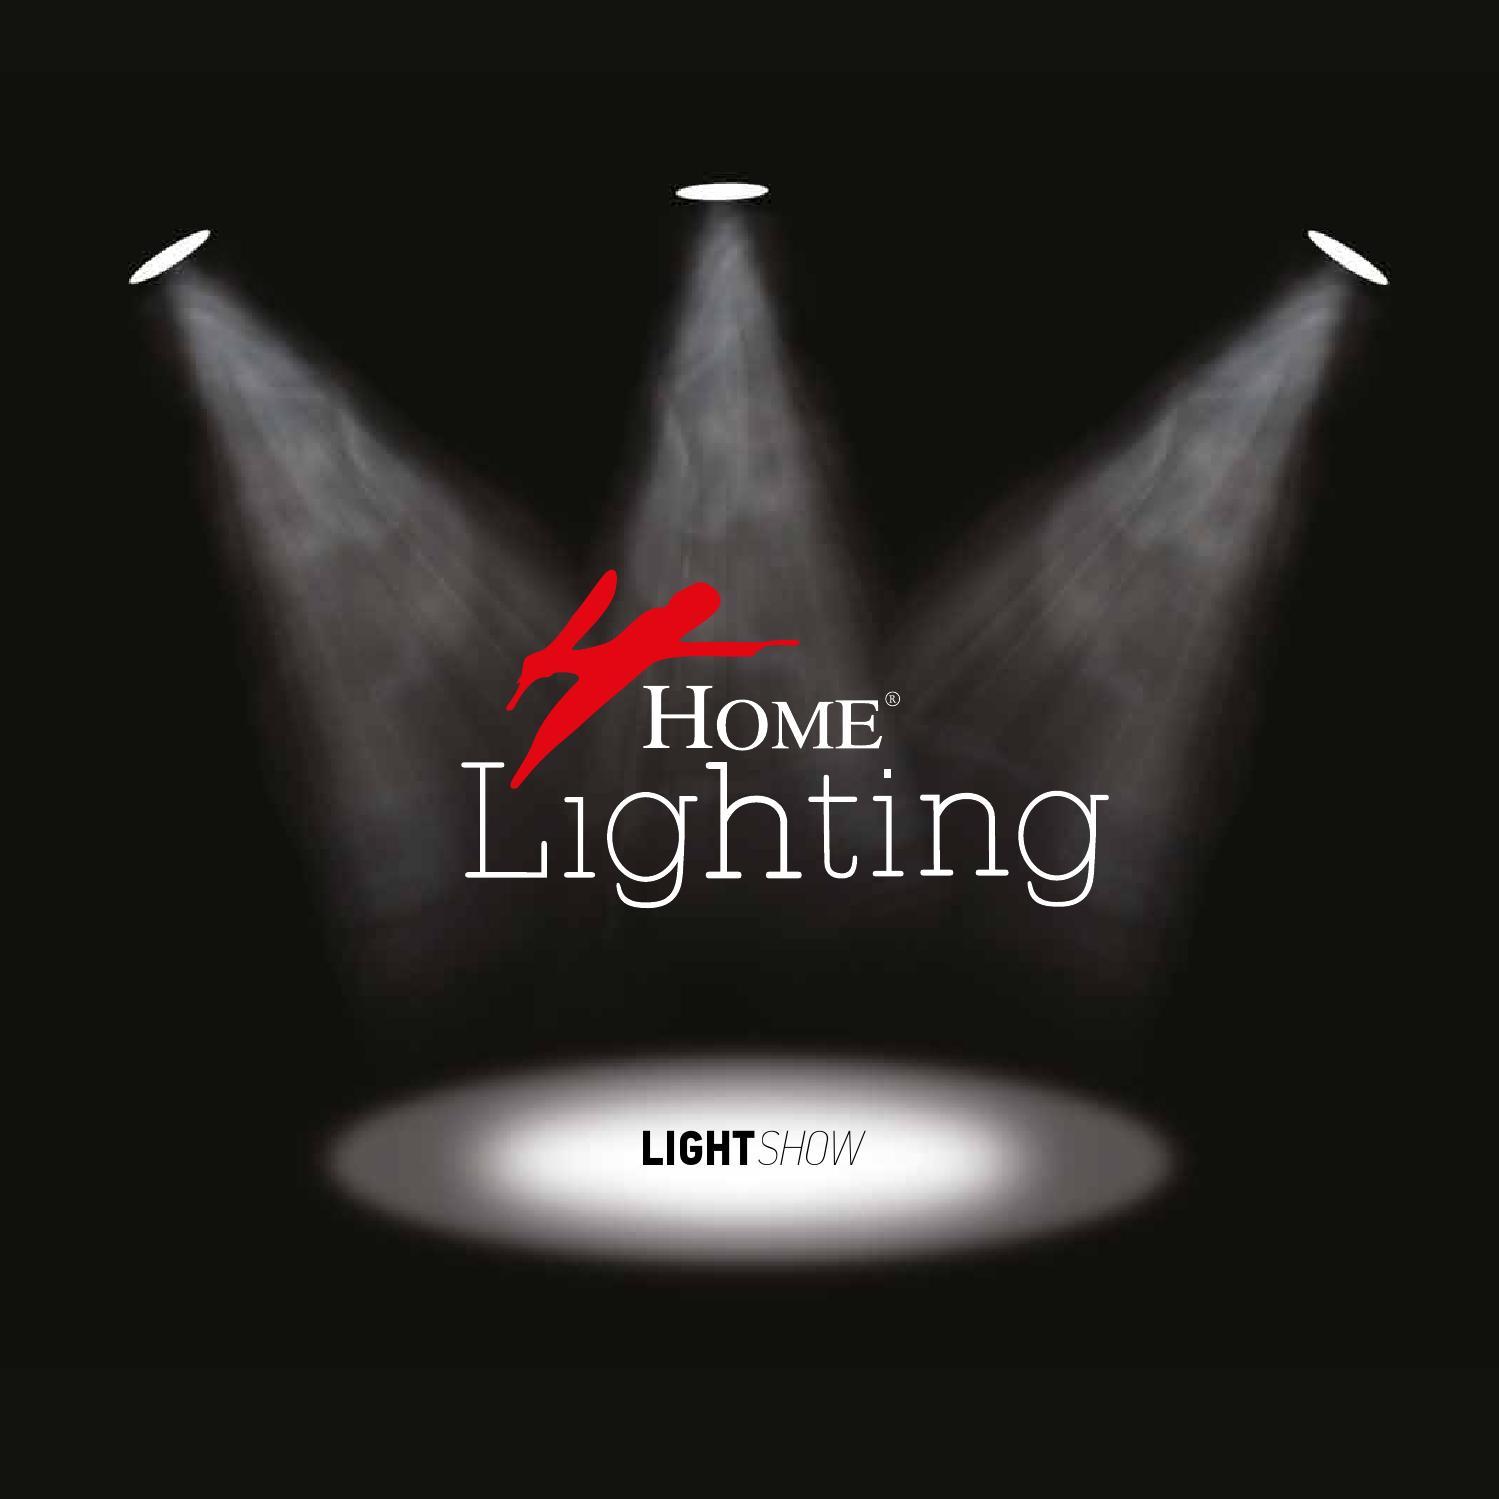 357c7ec032 Homelighting 2014 by mksi - issuu